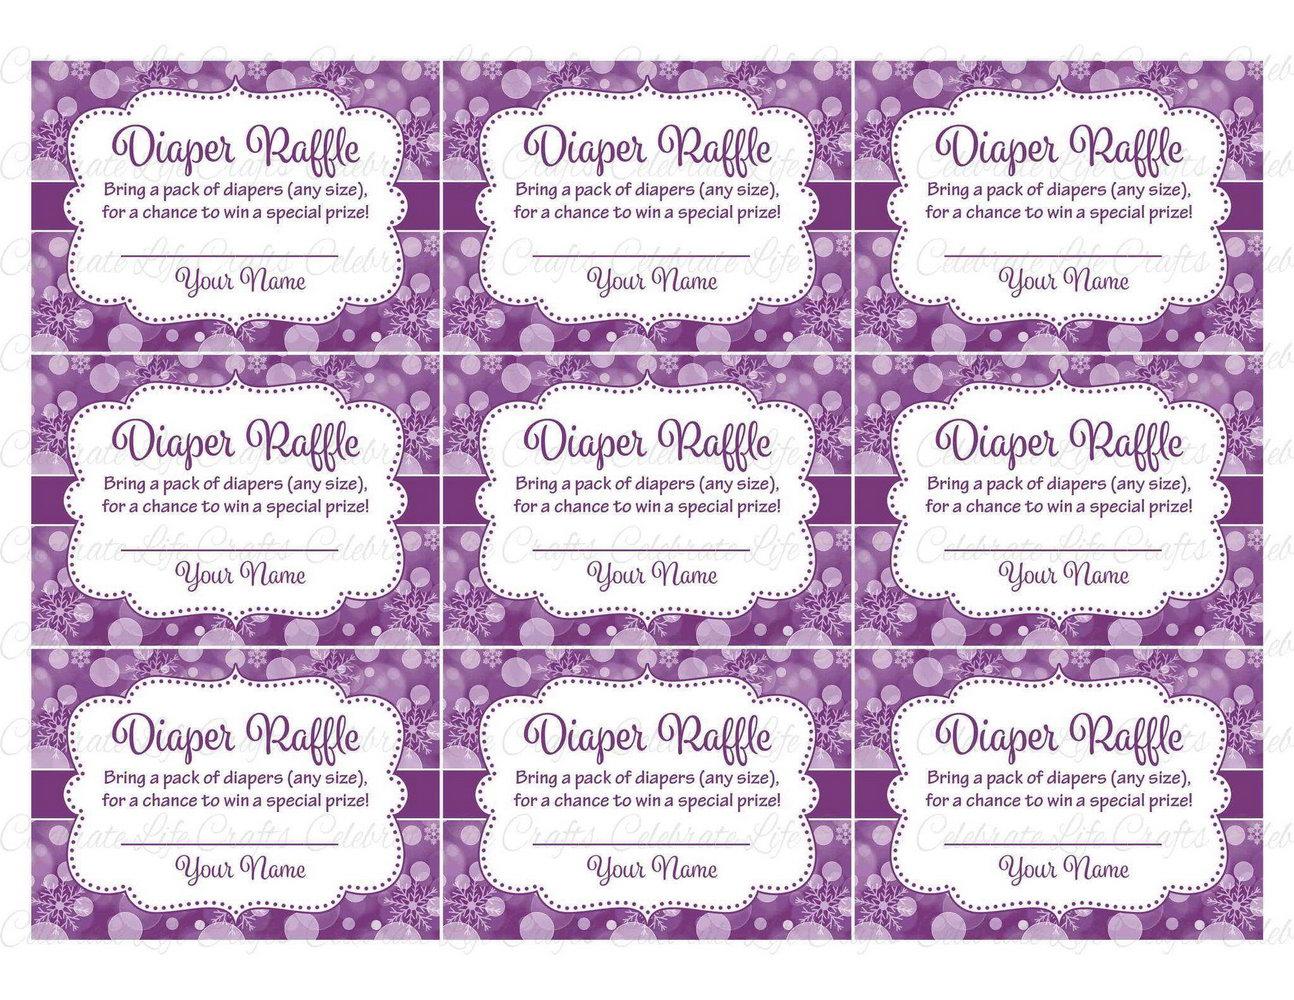 Diaper Raffle Card Template Free